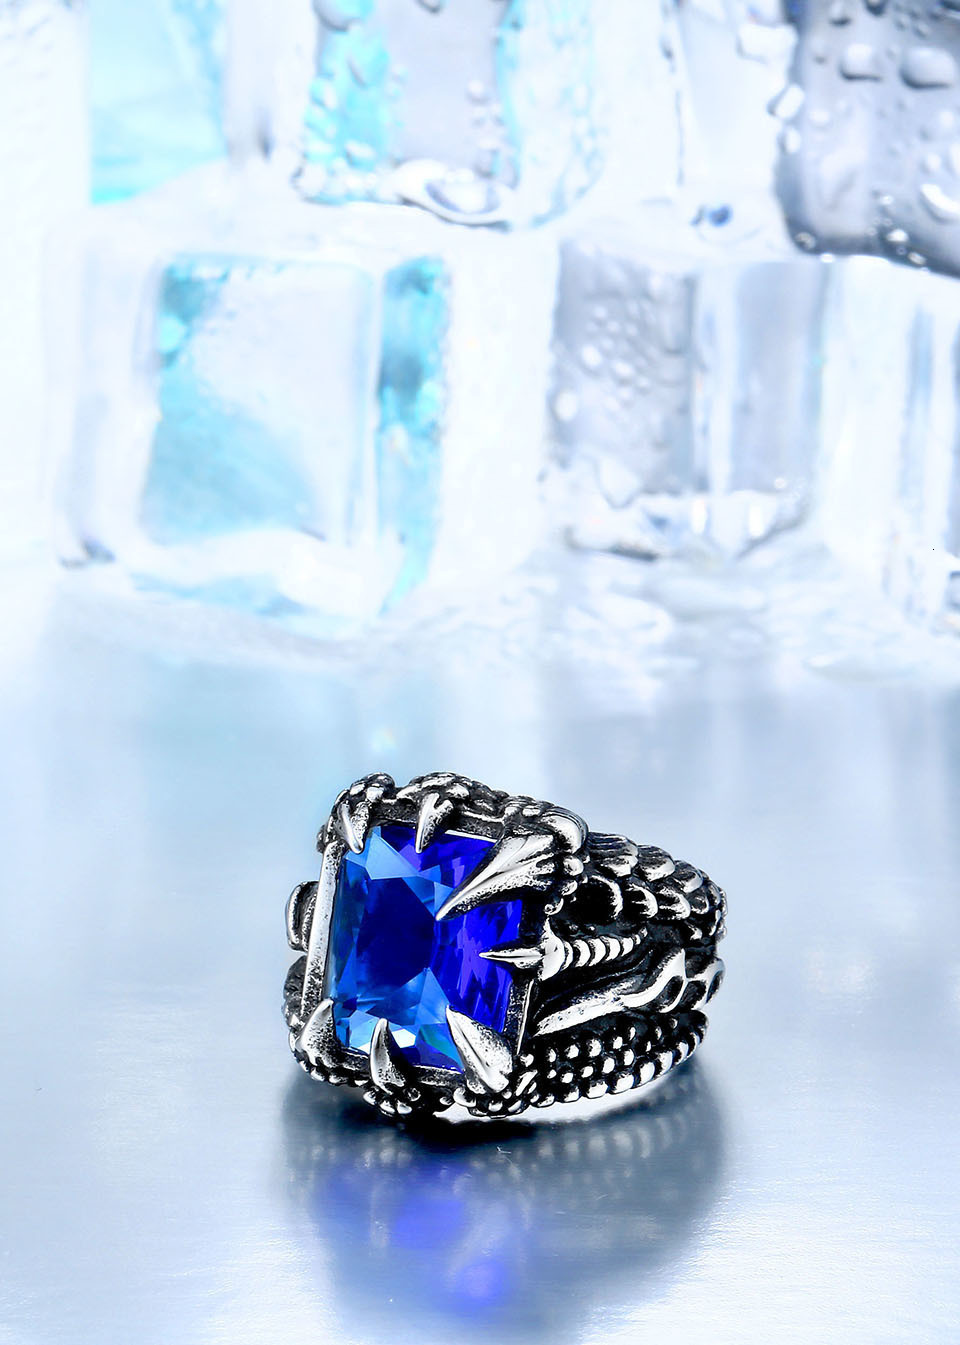 H79145e96d8da47cf93e1e4a71c6a3afcP - Paladin Dragon Claw Ring